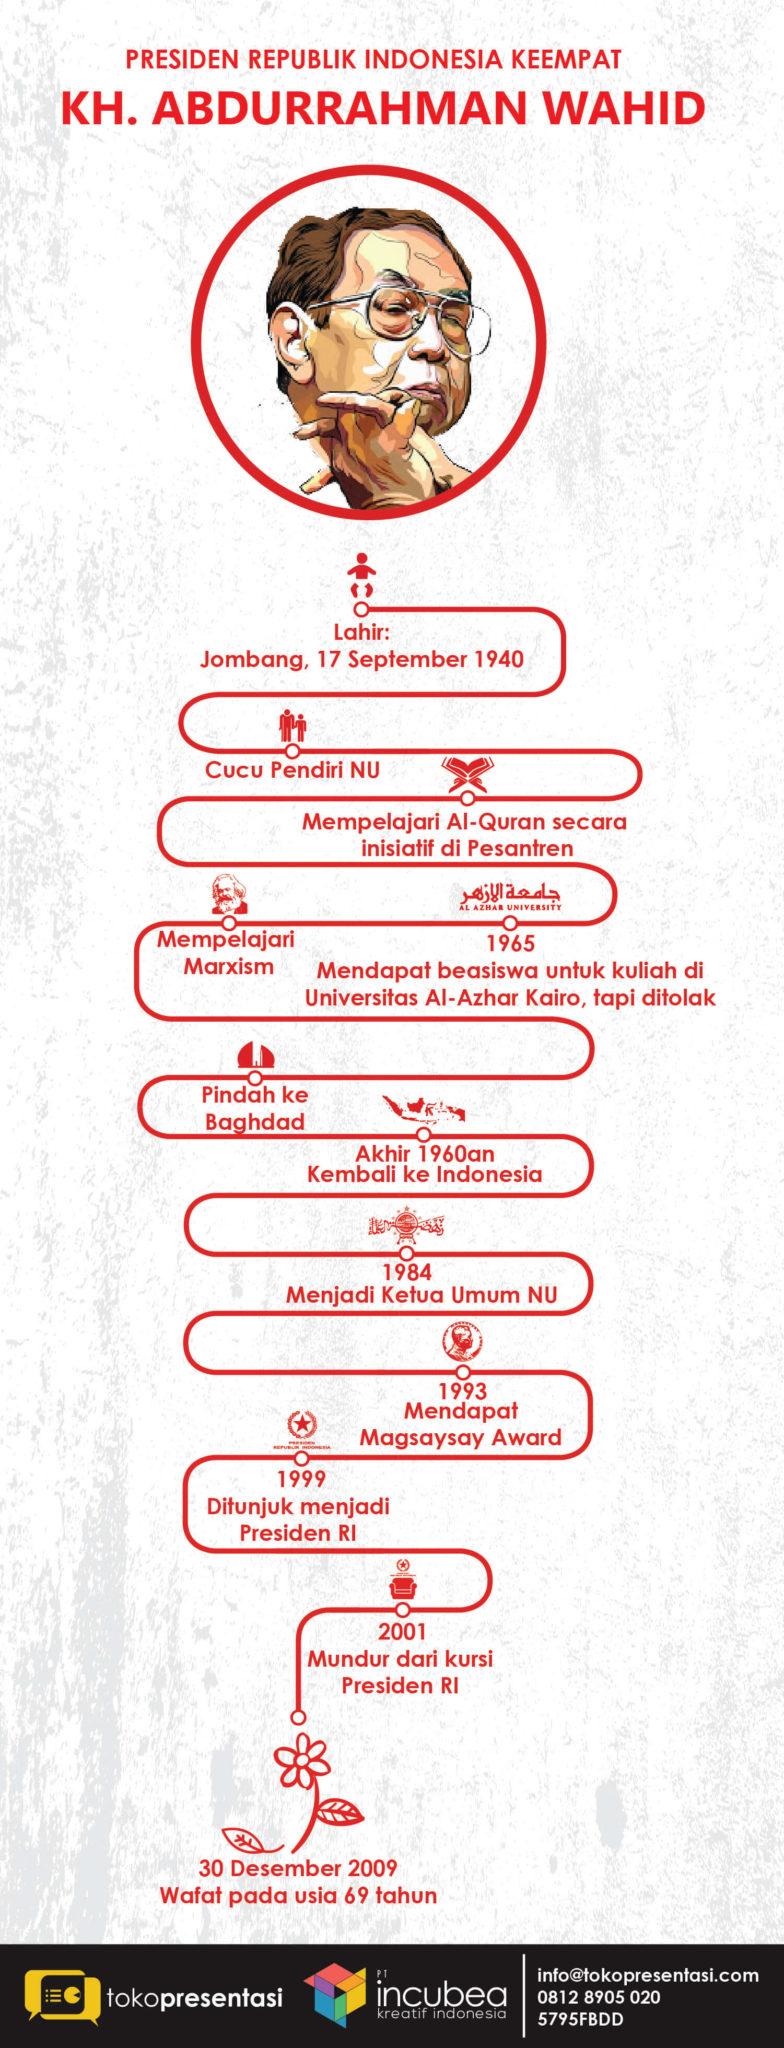 Infografis Presiden RI keempat KH Abdurrahman Wahid jasa infografis tokopresentasi-08